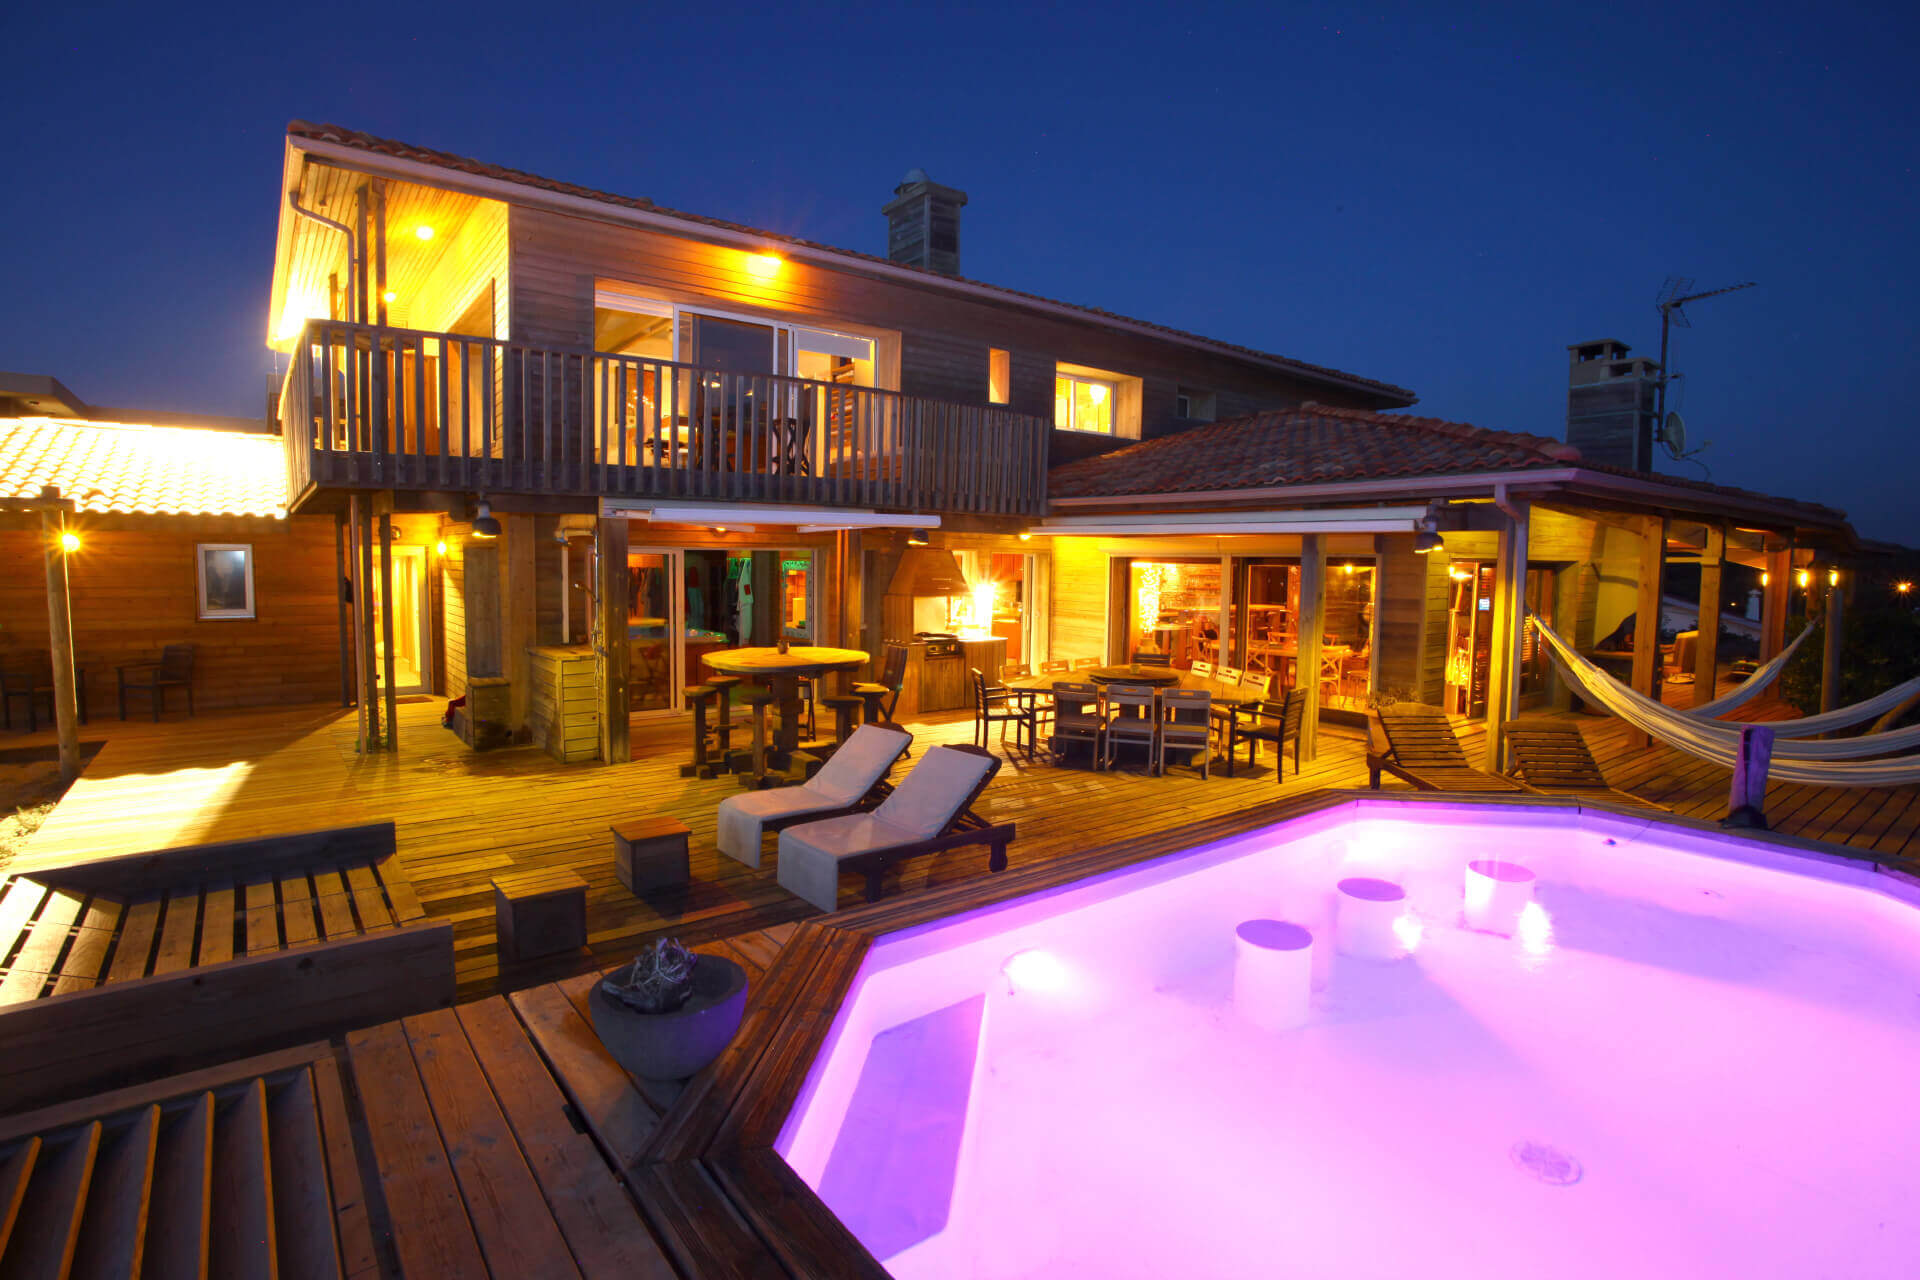 piscine 1a - Location Villa de Vacances en Bord de Mer à Seignosse Hossegor Landes